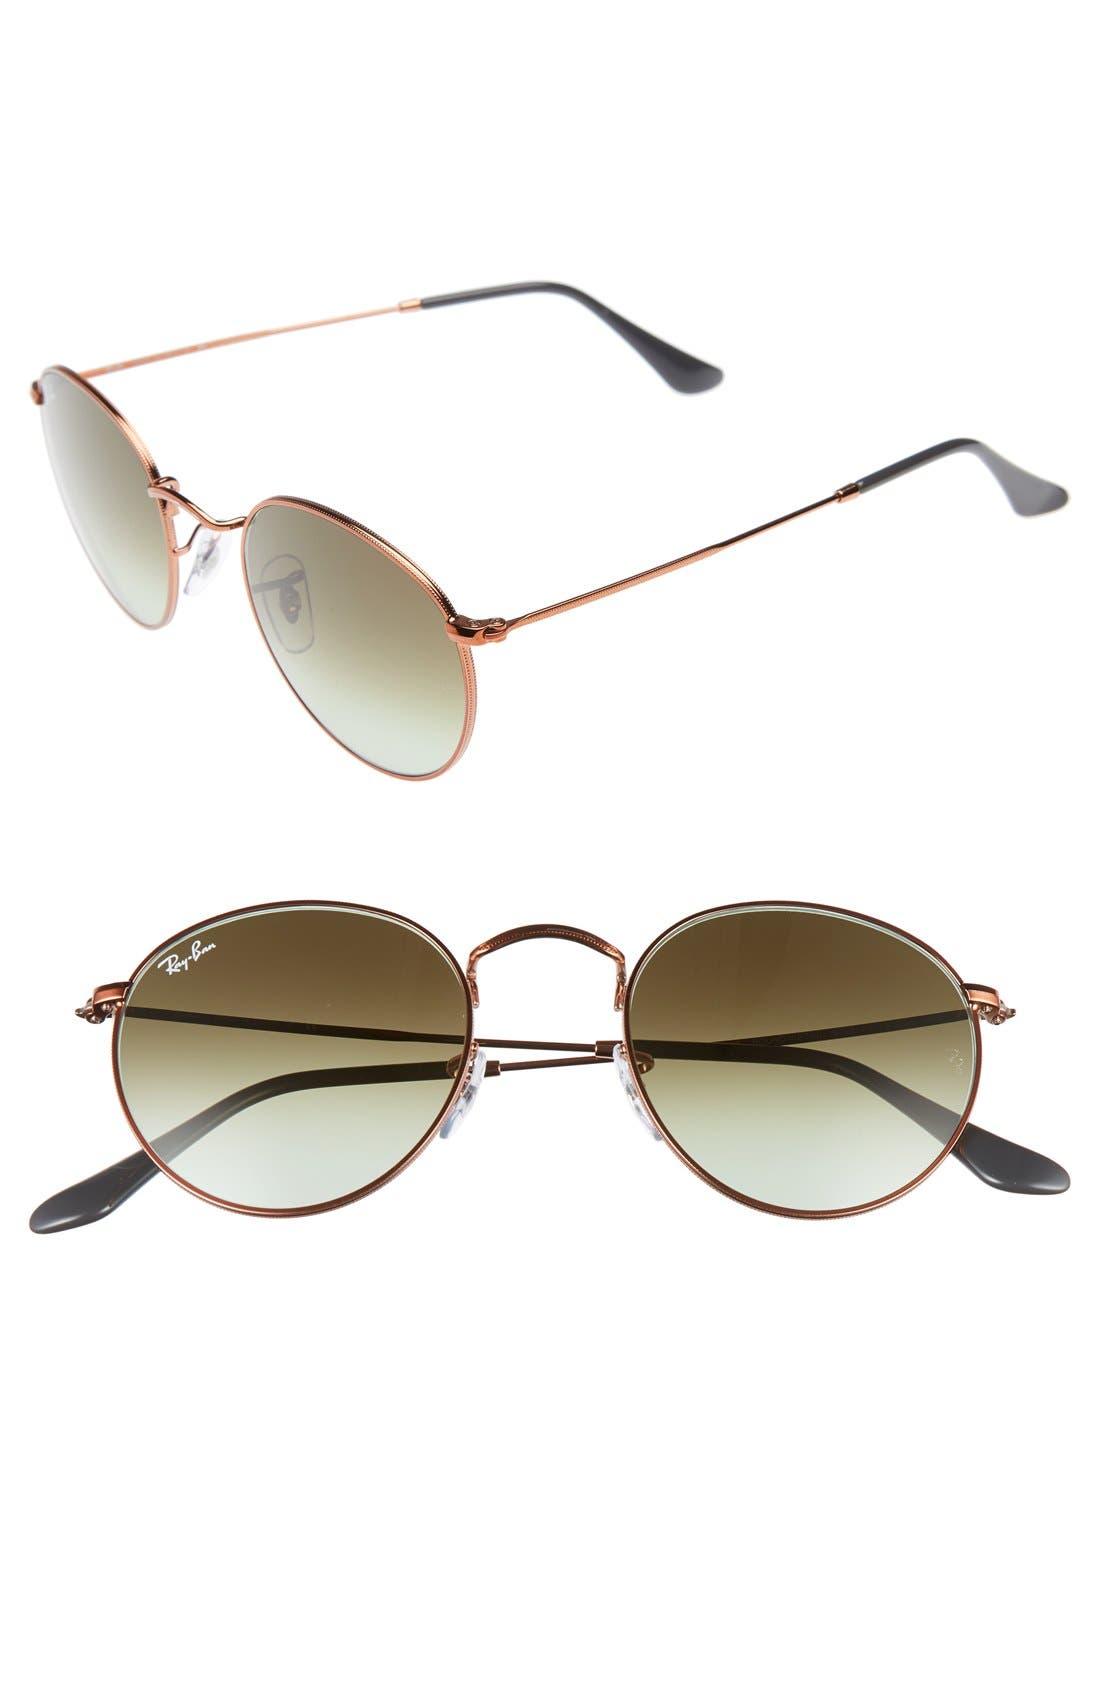 Main Image - Ray-Ban Icons 50mm Retro Sunglasses